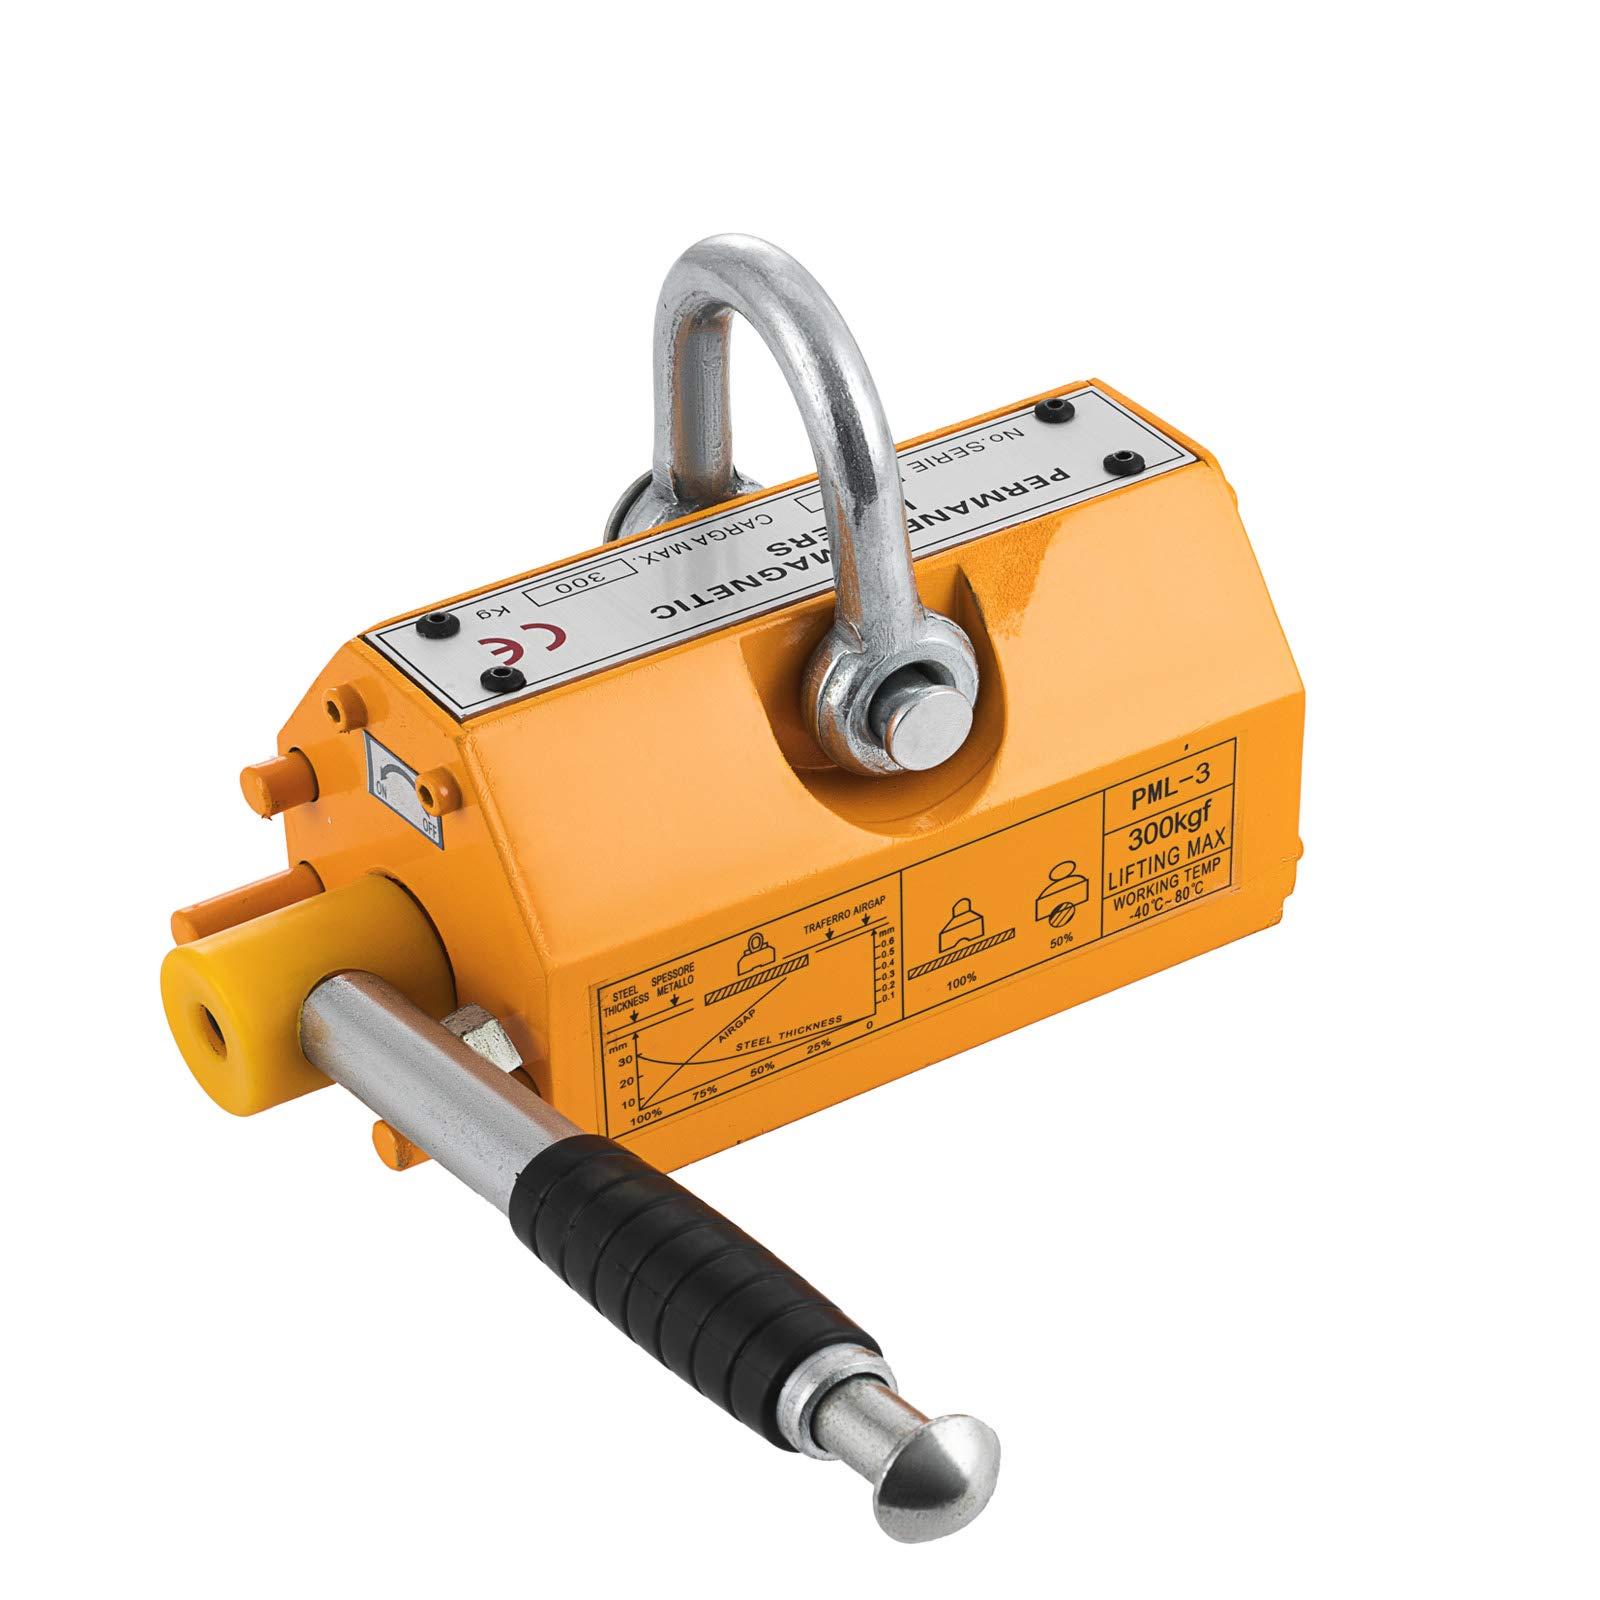 SHZOND Magnetic Lifter 660LBS Crane Hoist Lifting Magnet Neodymium Iron 300KG Metal Lifting Magnet (660LB)